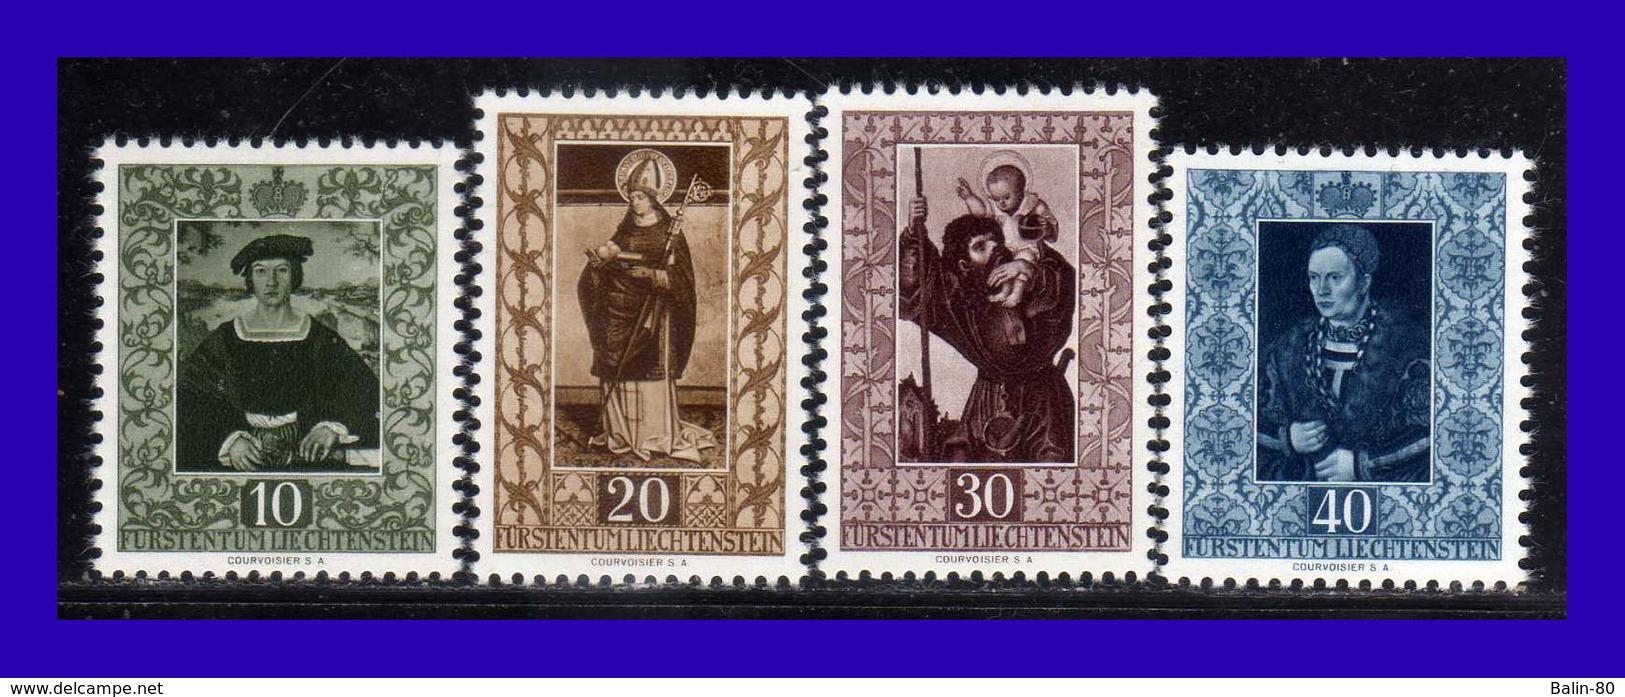 1953 - Liechtenstein - Sc. 266 - 269 - MNH - LI - 194 - 136 - Liechtenstein